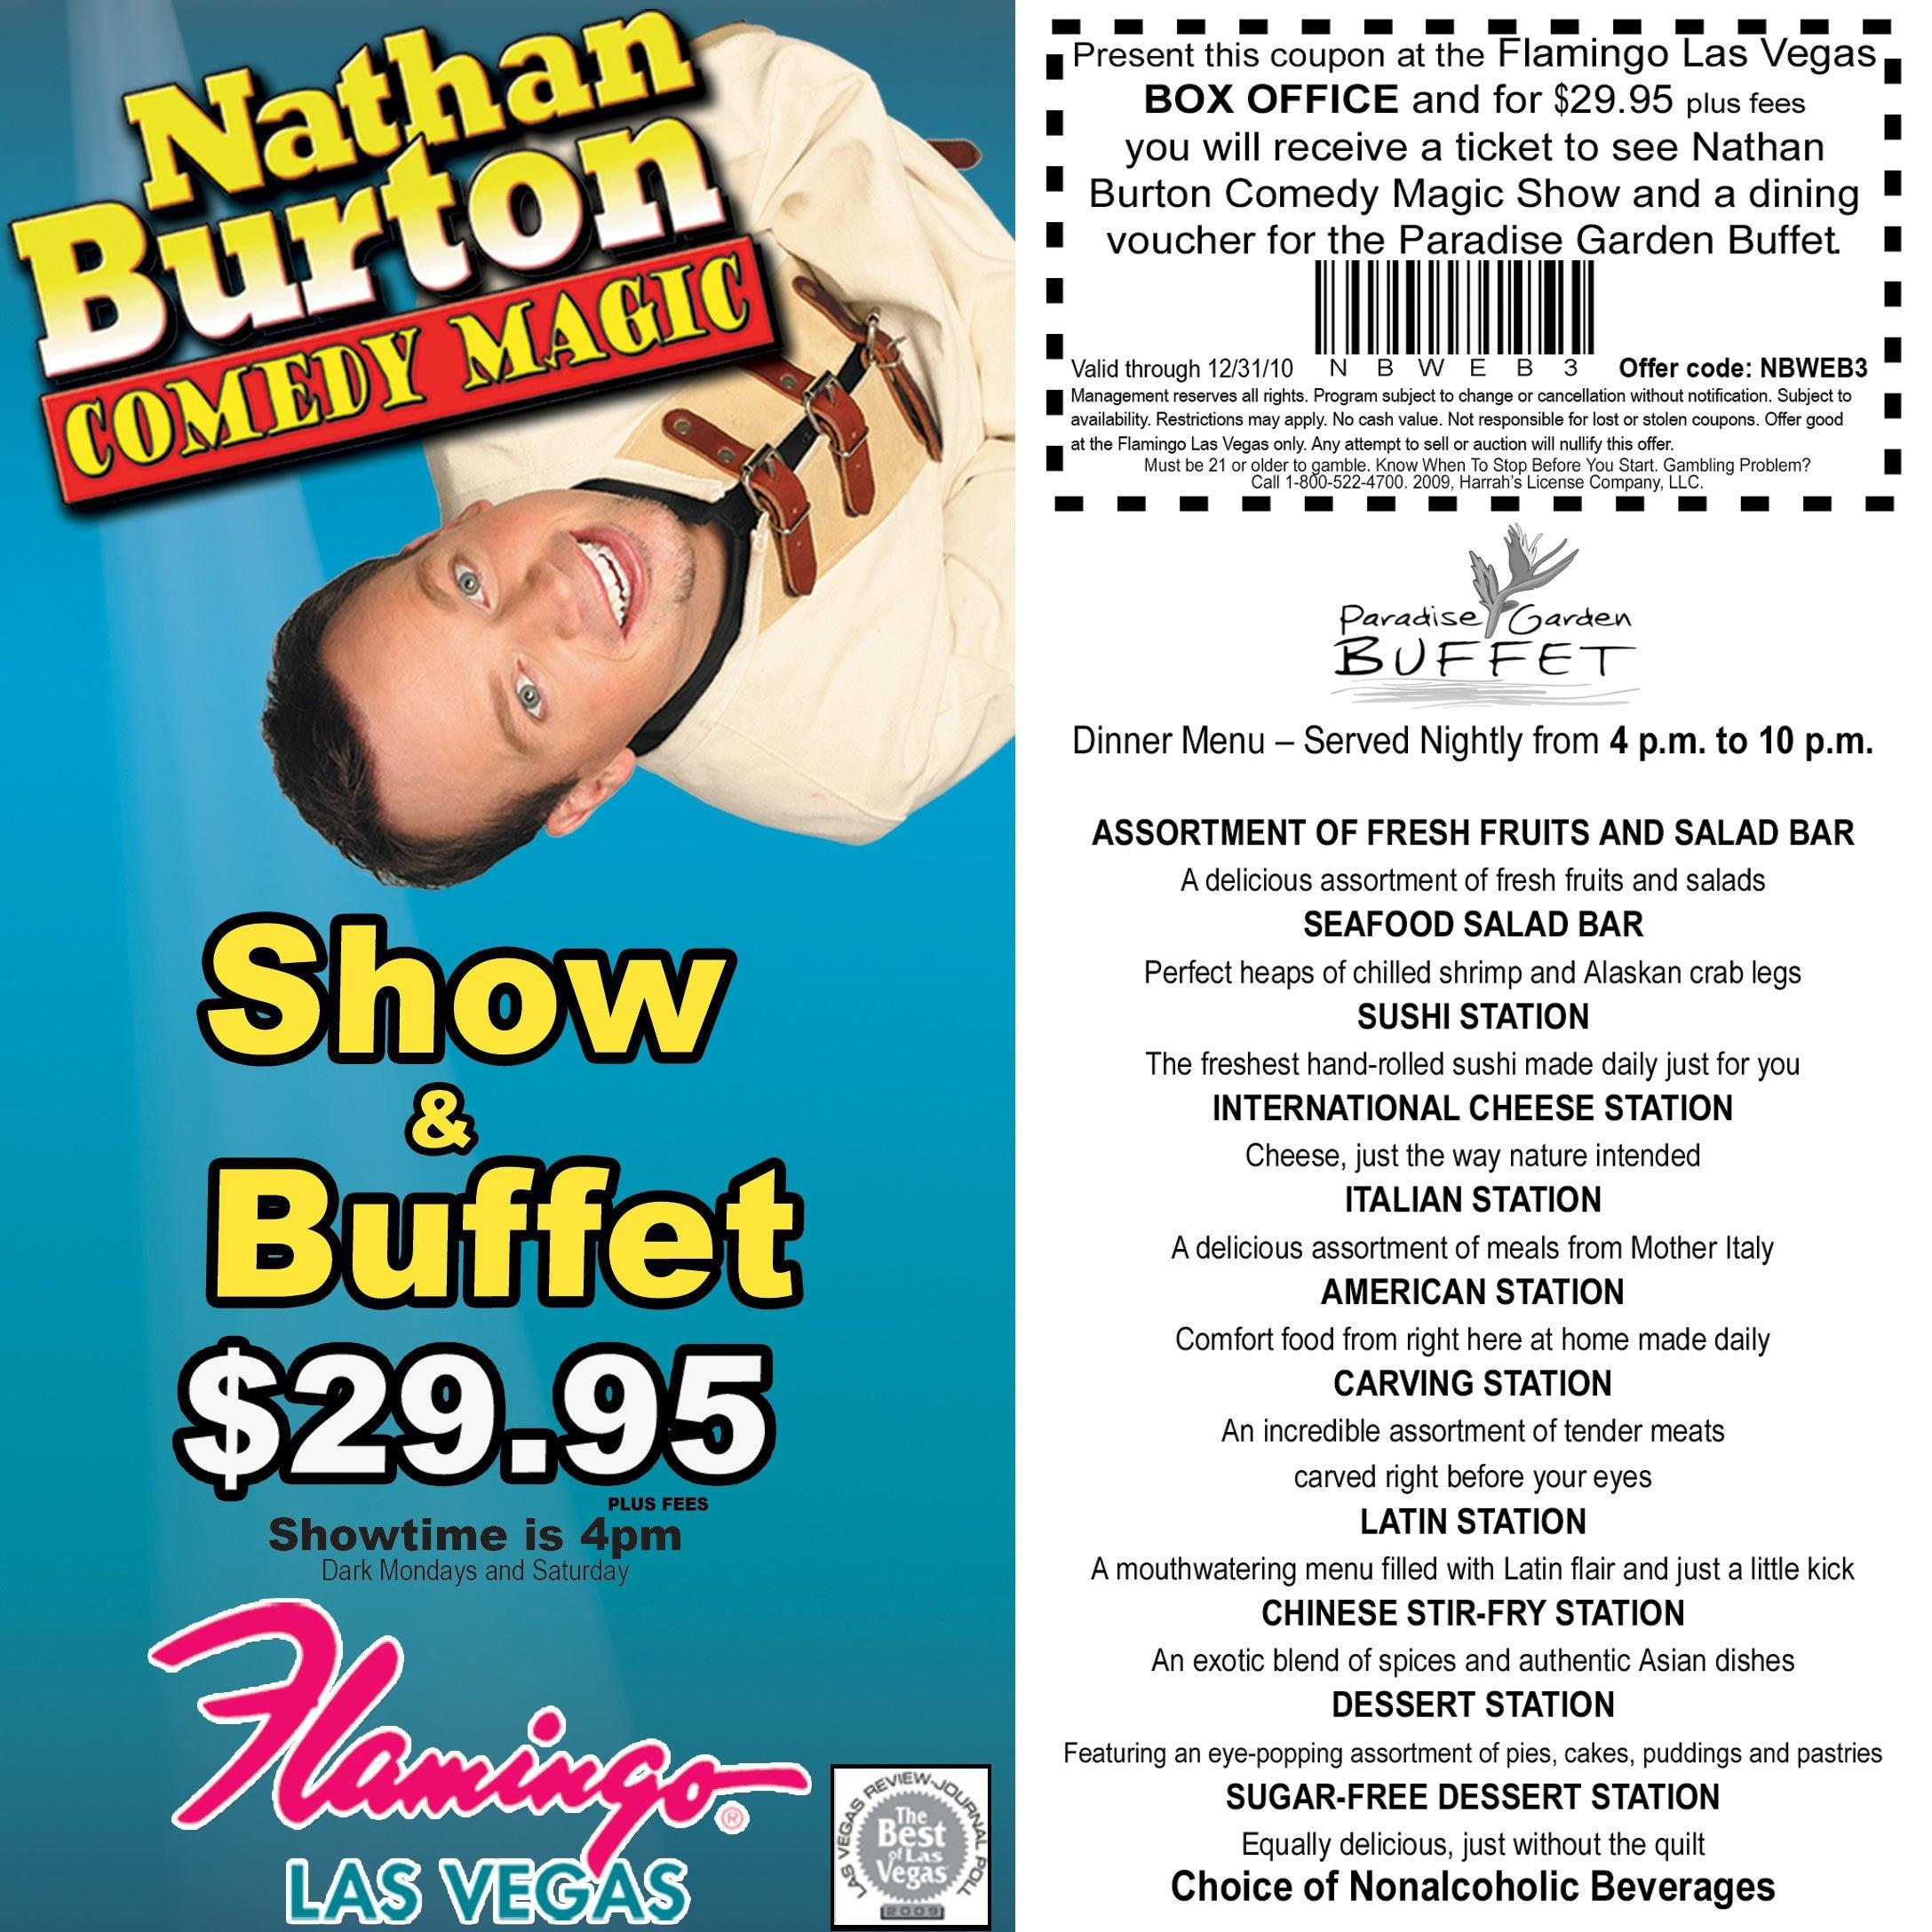 Las Vegas Coupons 2 For 1 Discounts Buffet Deals Salad Bar Buffet - Free Las Vegas Buffet Coupons Printable